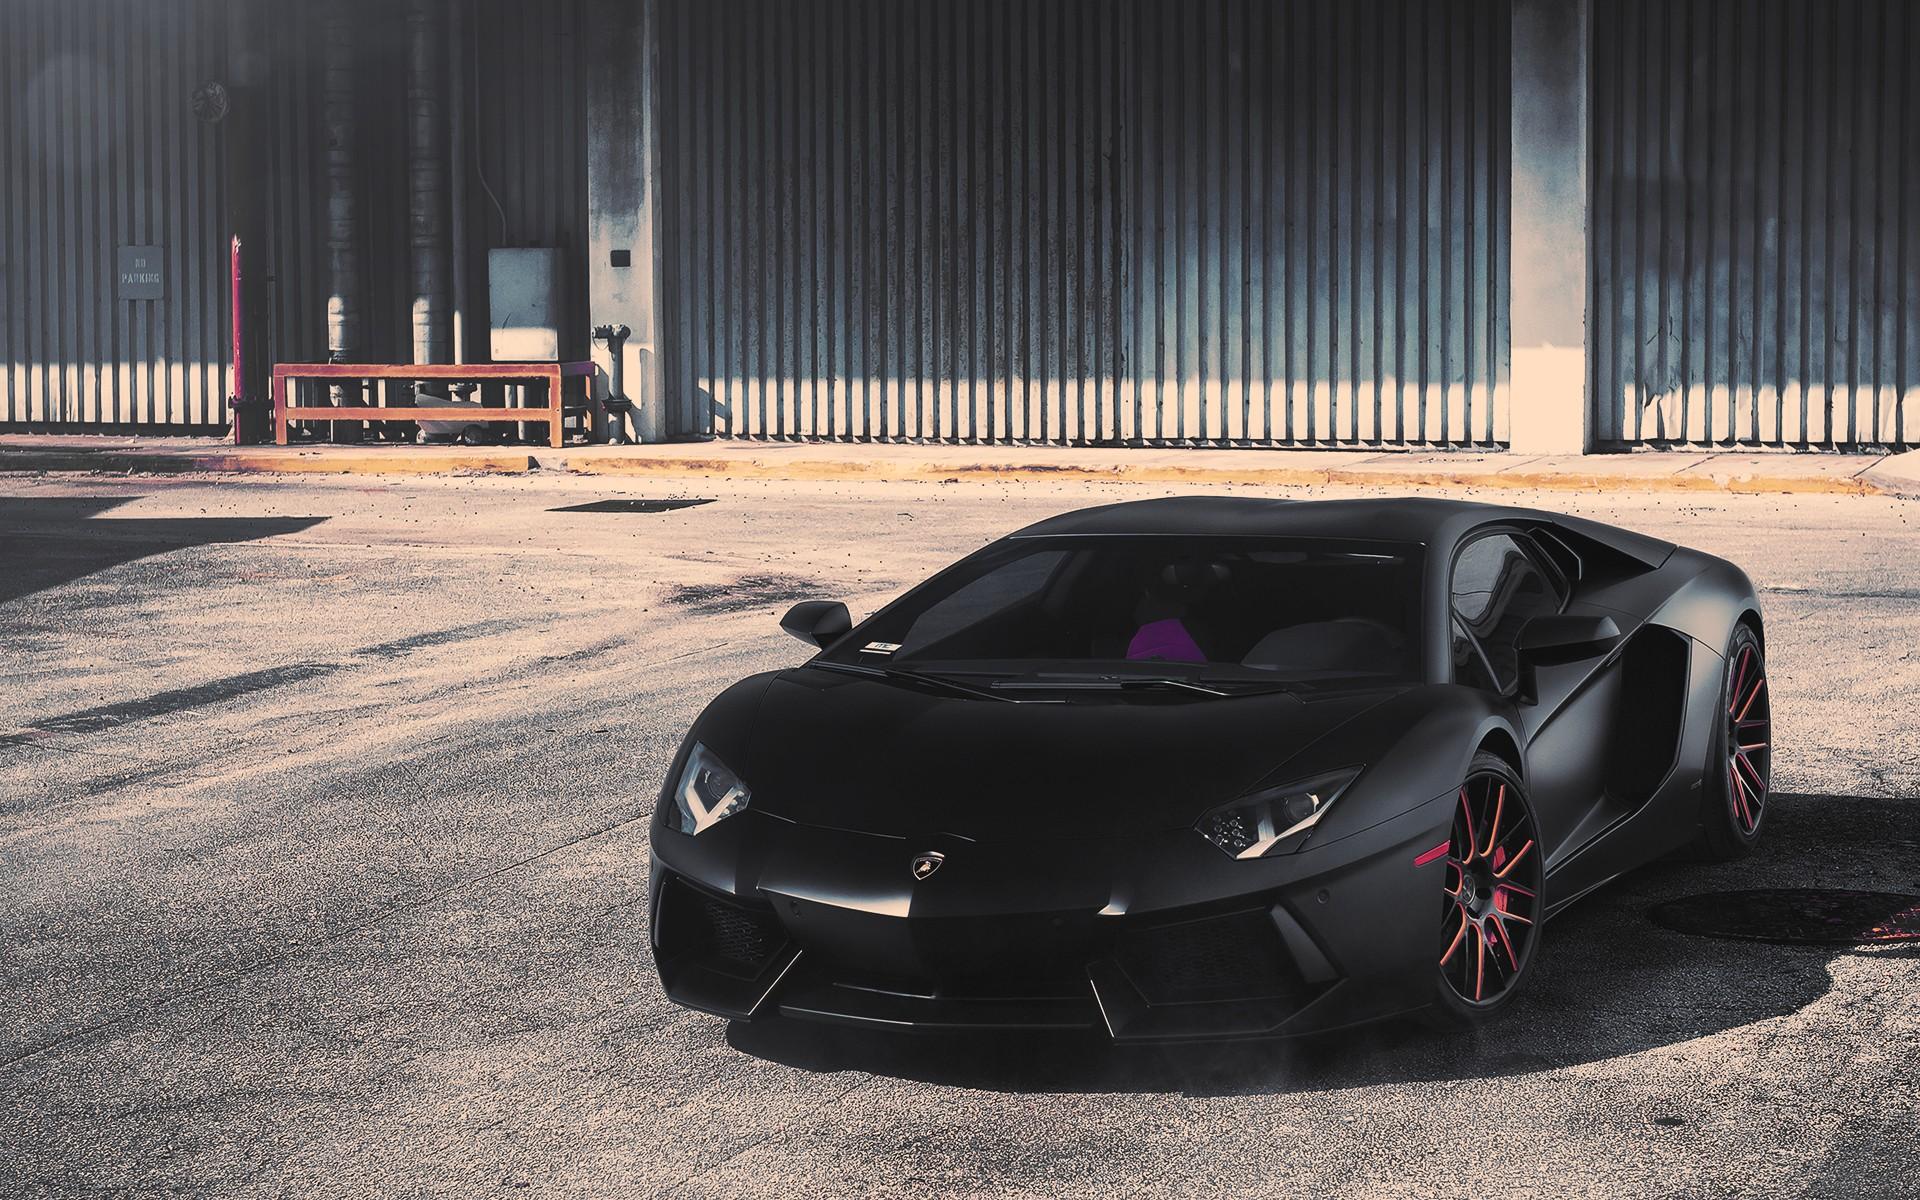 Black Matte Lamborghini Aventador Wallpapers 1920x1200